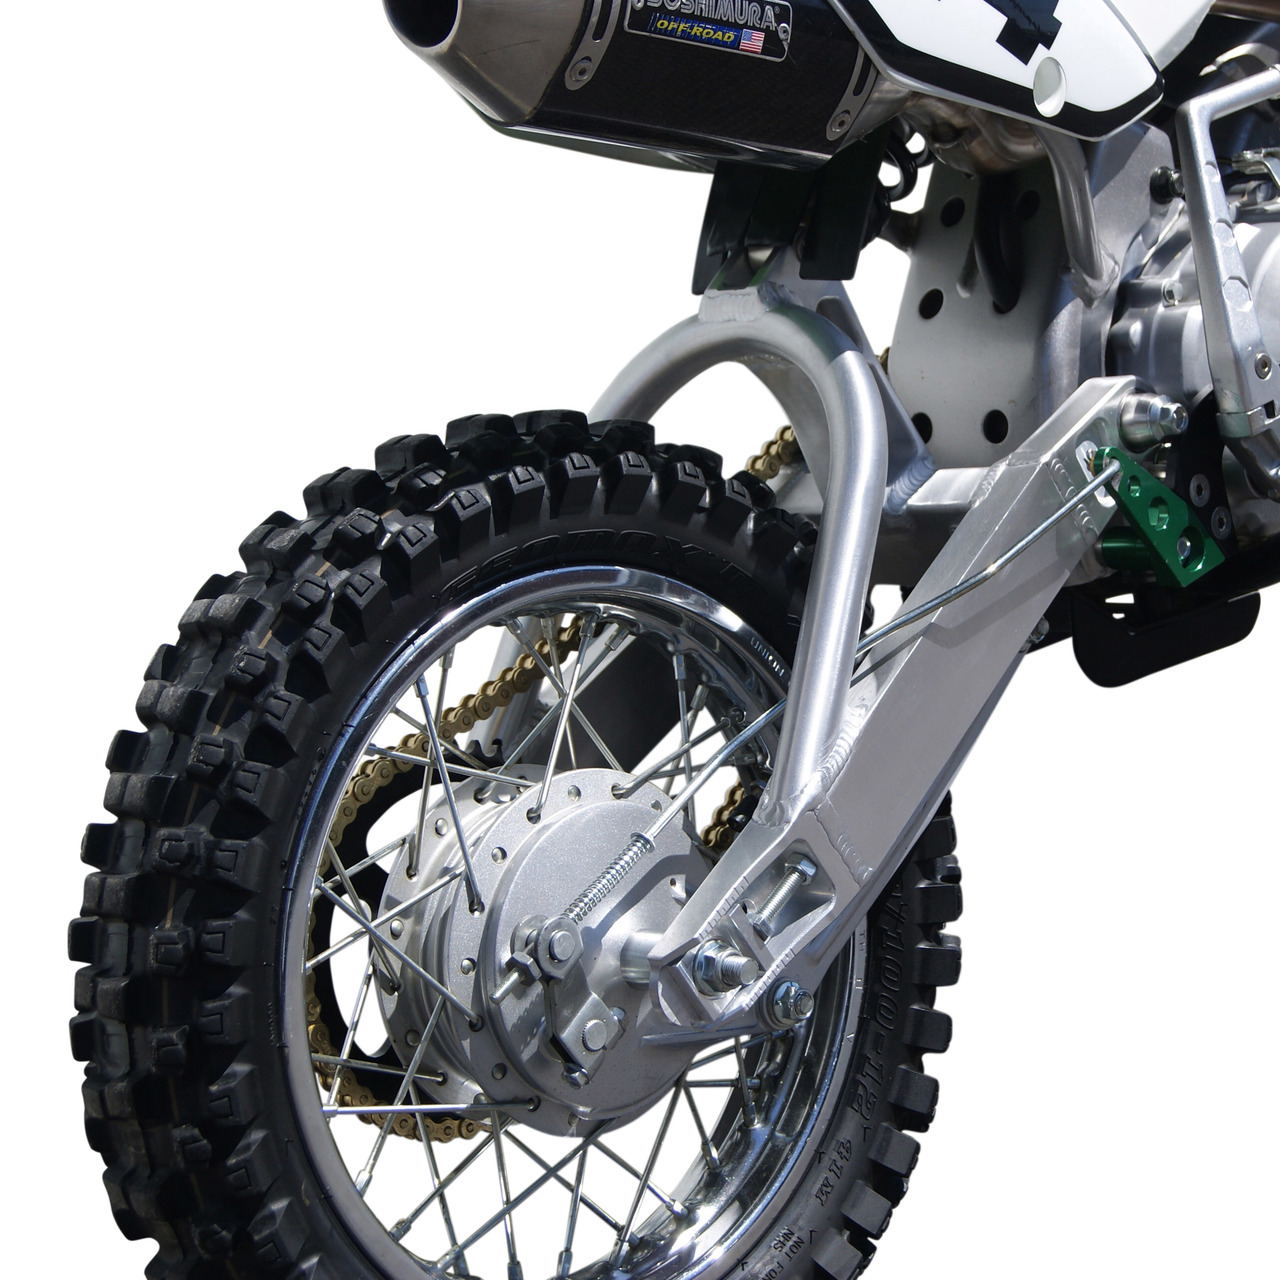 Kawasaki Klx Dirt Bike Wiring Diagram on